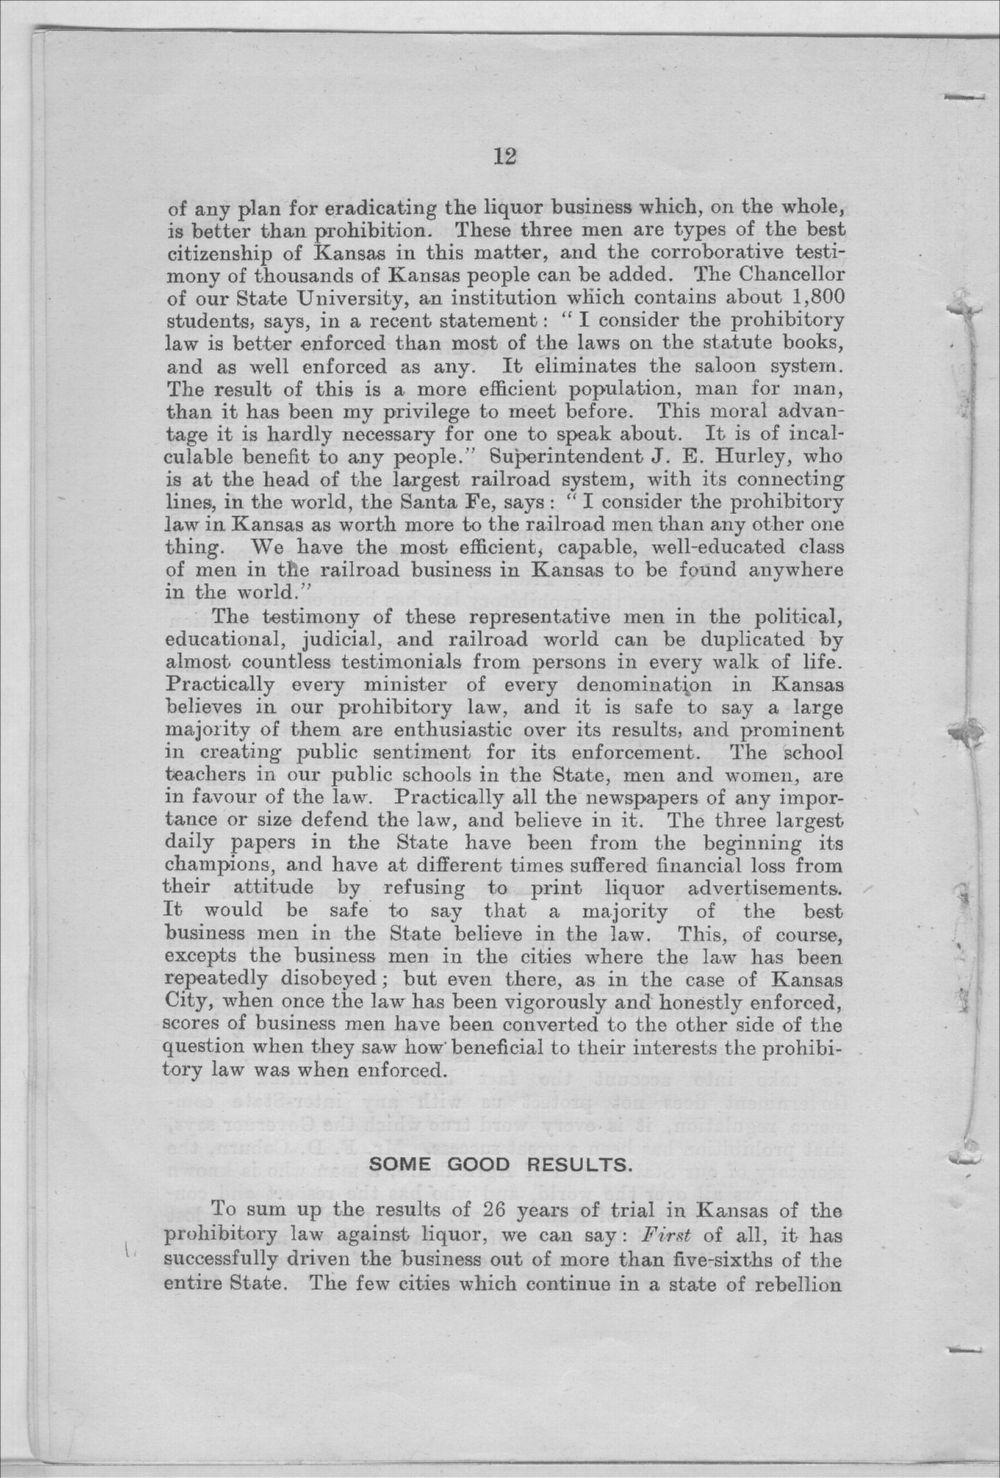 Prohibition in Kansas, U.S.A. - 12